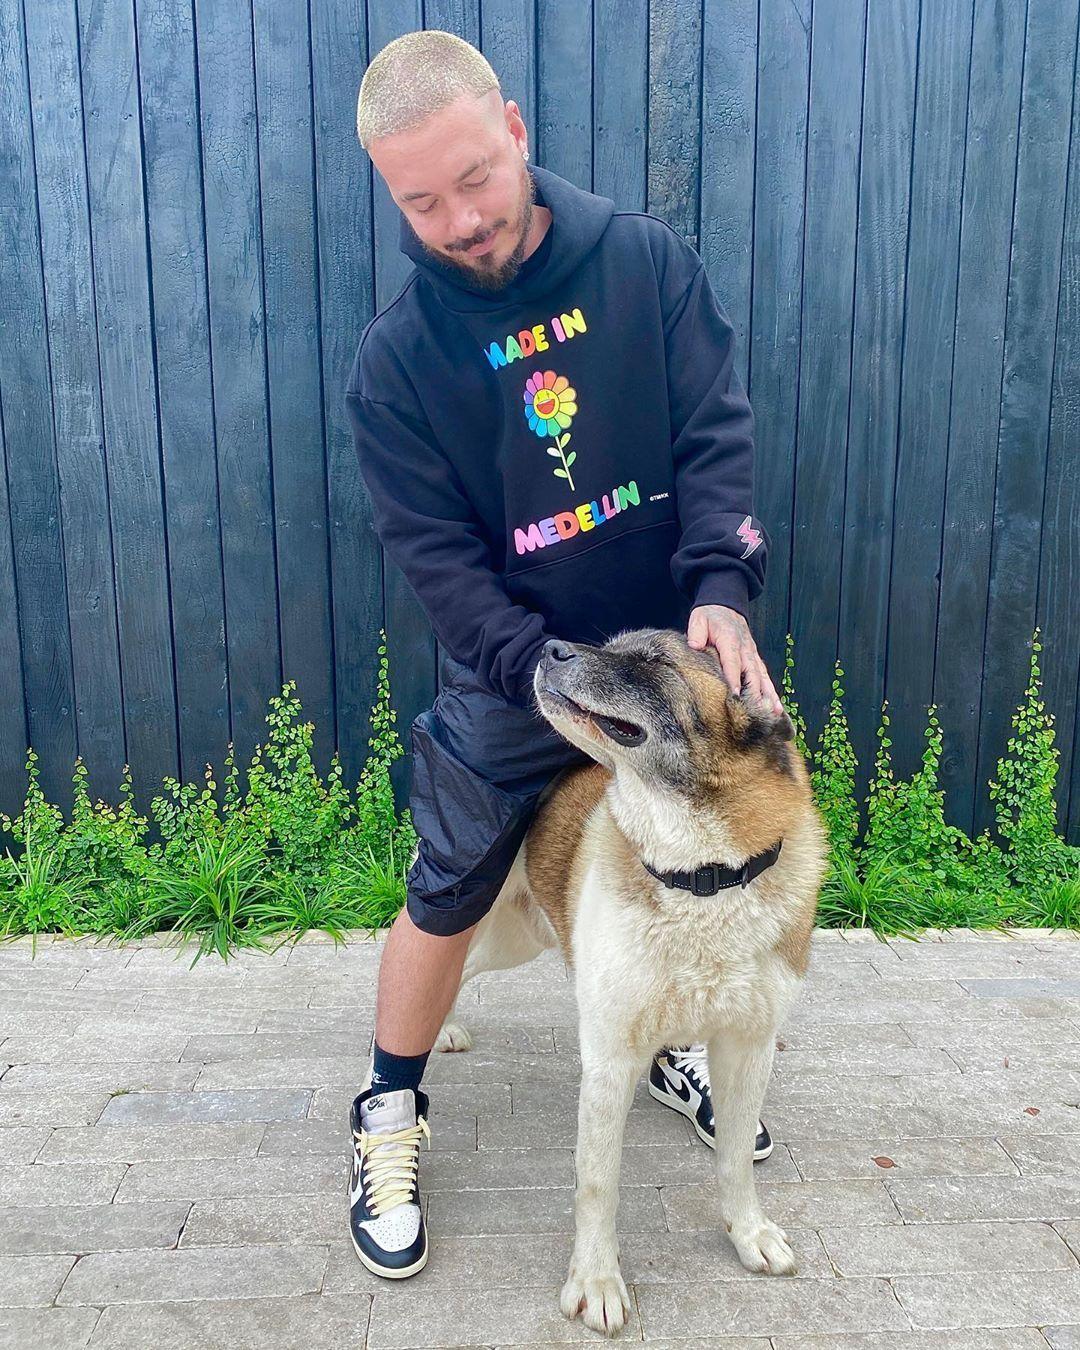 J Balvin On Instagram El Nino Jordan85 In 2020 Man And Dog Trap Music Songwriting